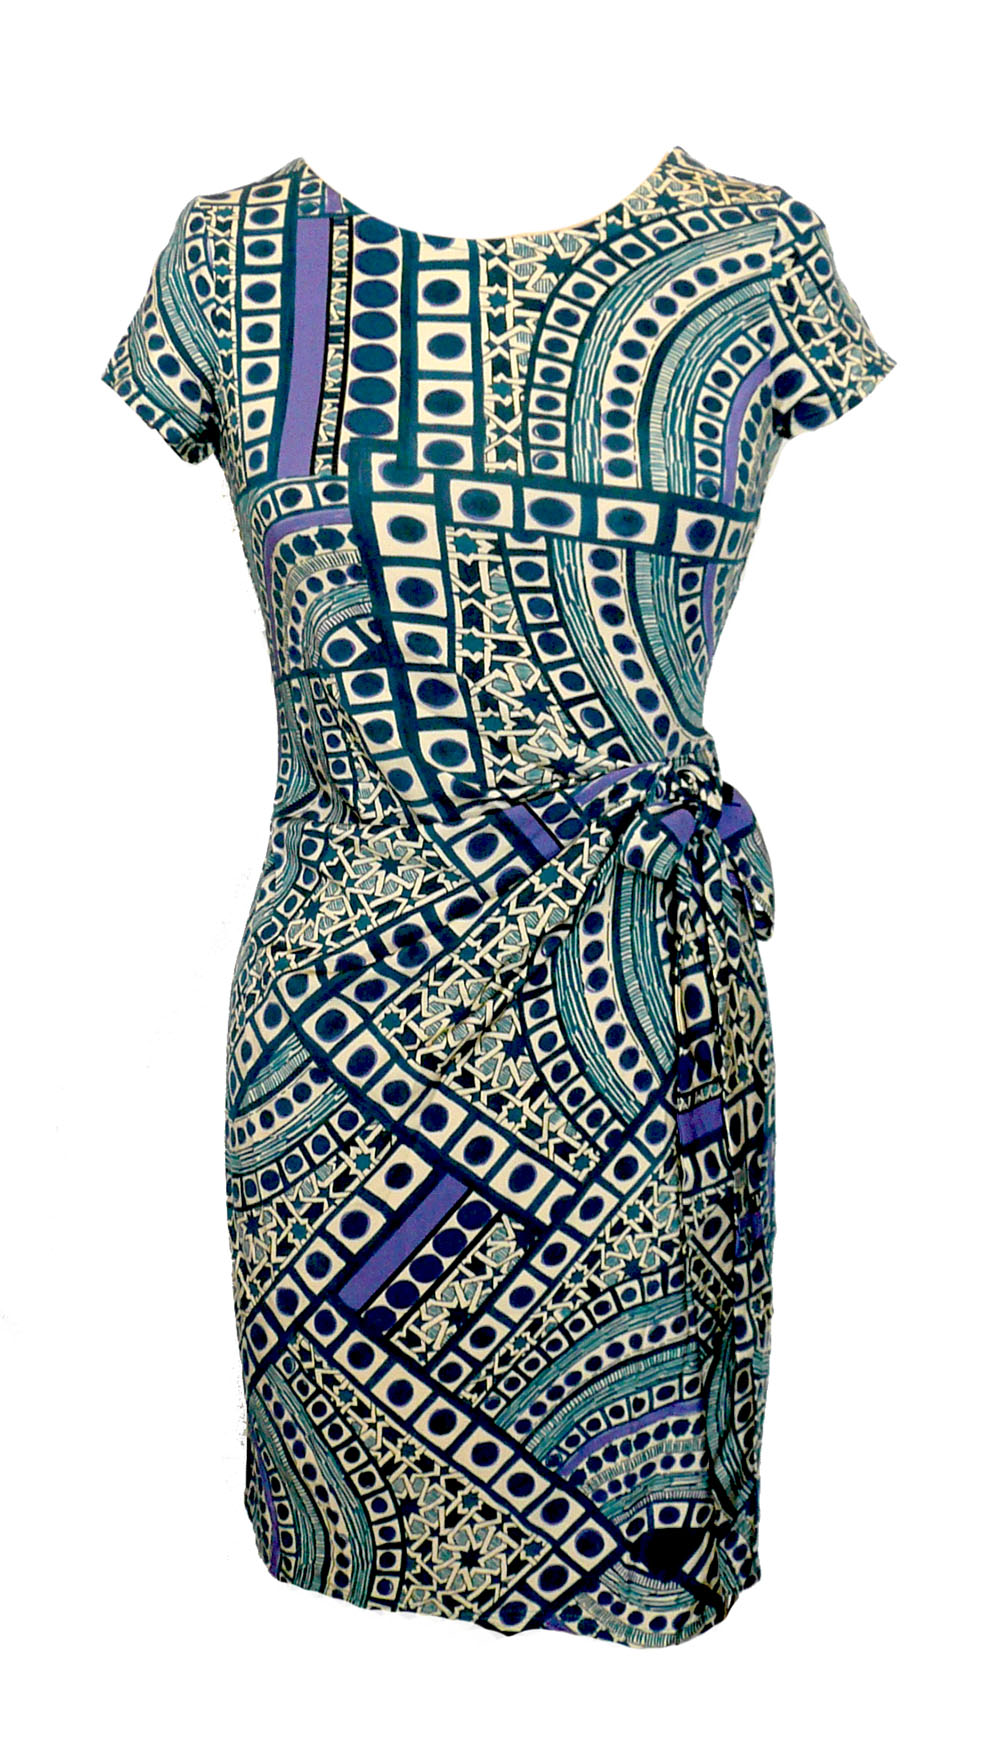 dress leota mosaic.jpg